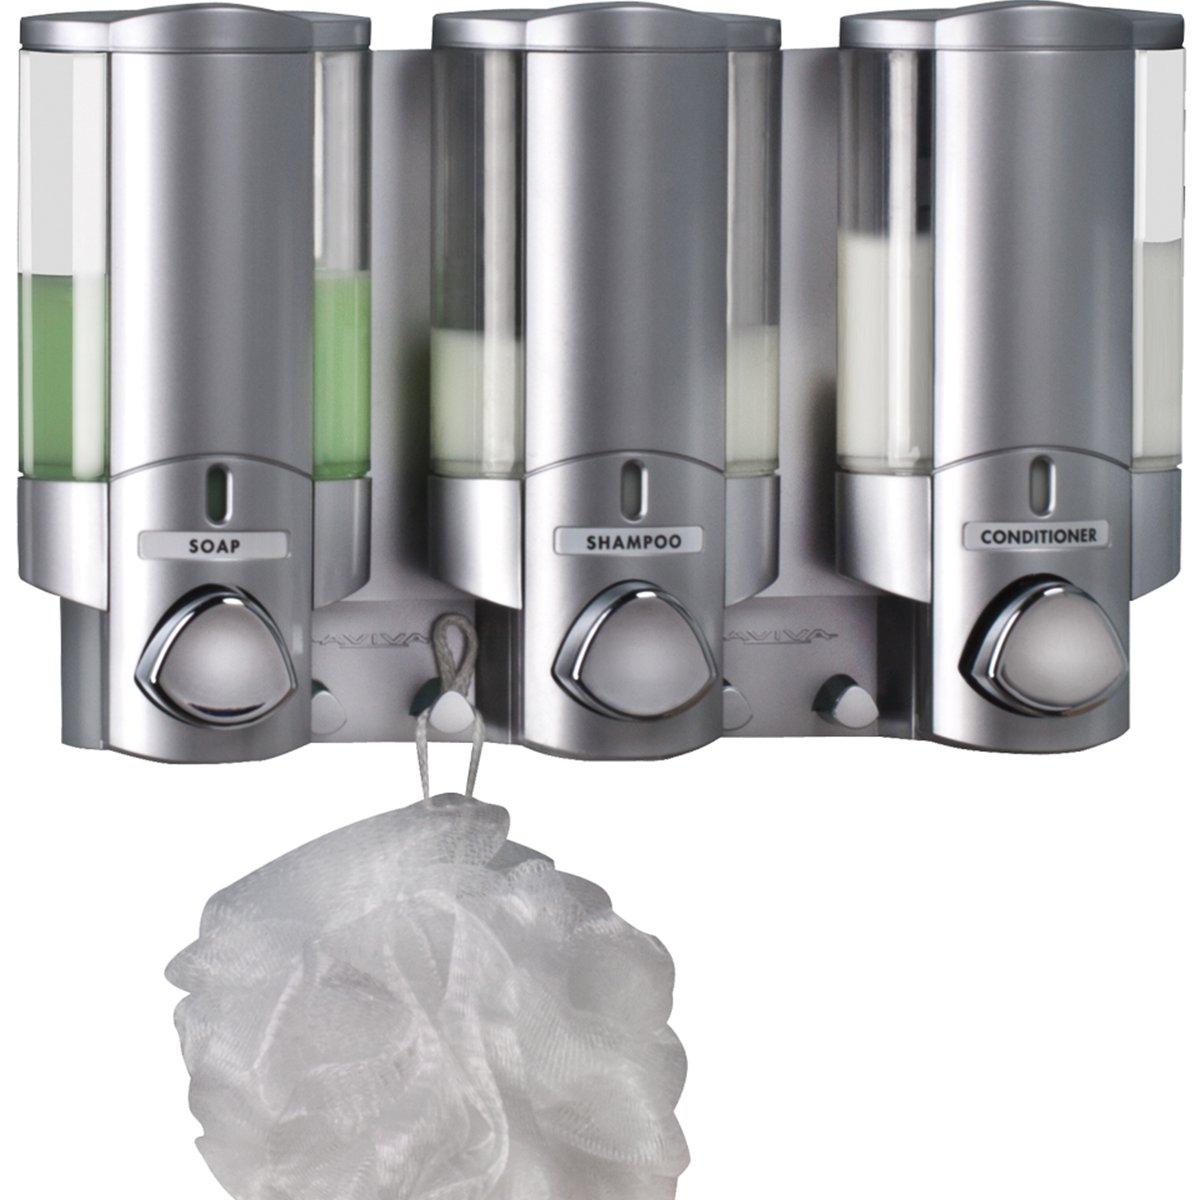 Merveilleux Amazon.com: Better Living Products 76335 1 AVIVA Three Chamber Dispenser,  Satin: Home U0026 Kitchen